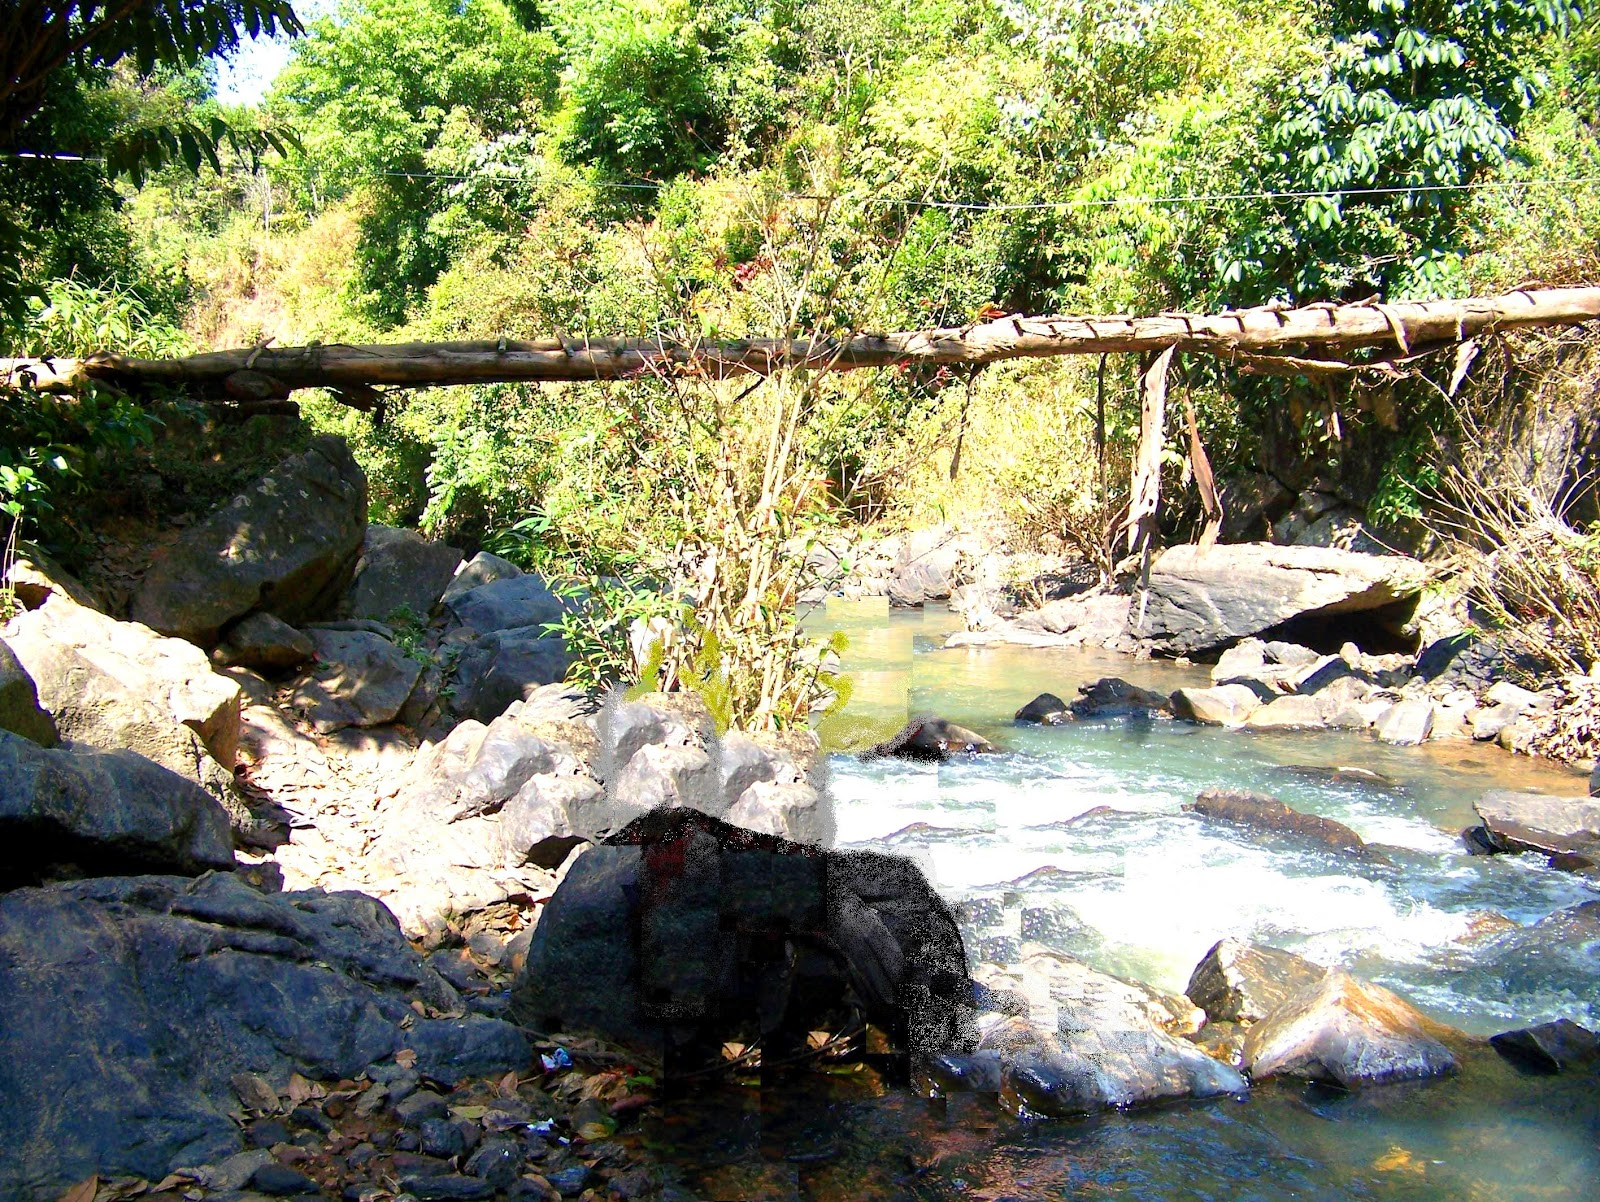 The Bridge across the brook